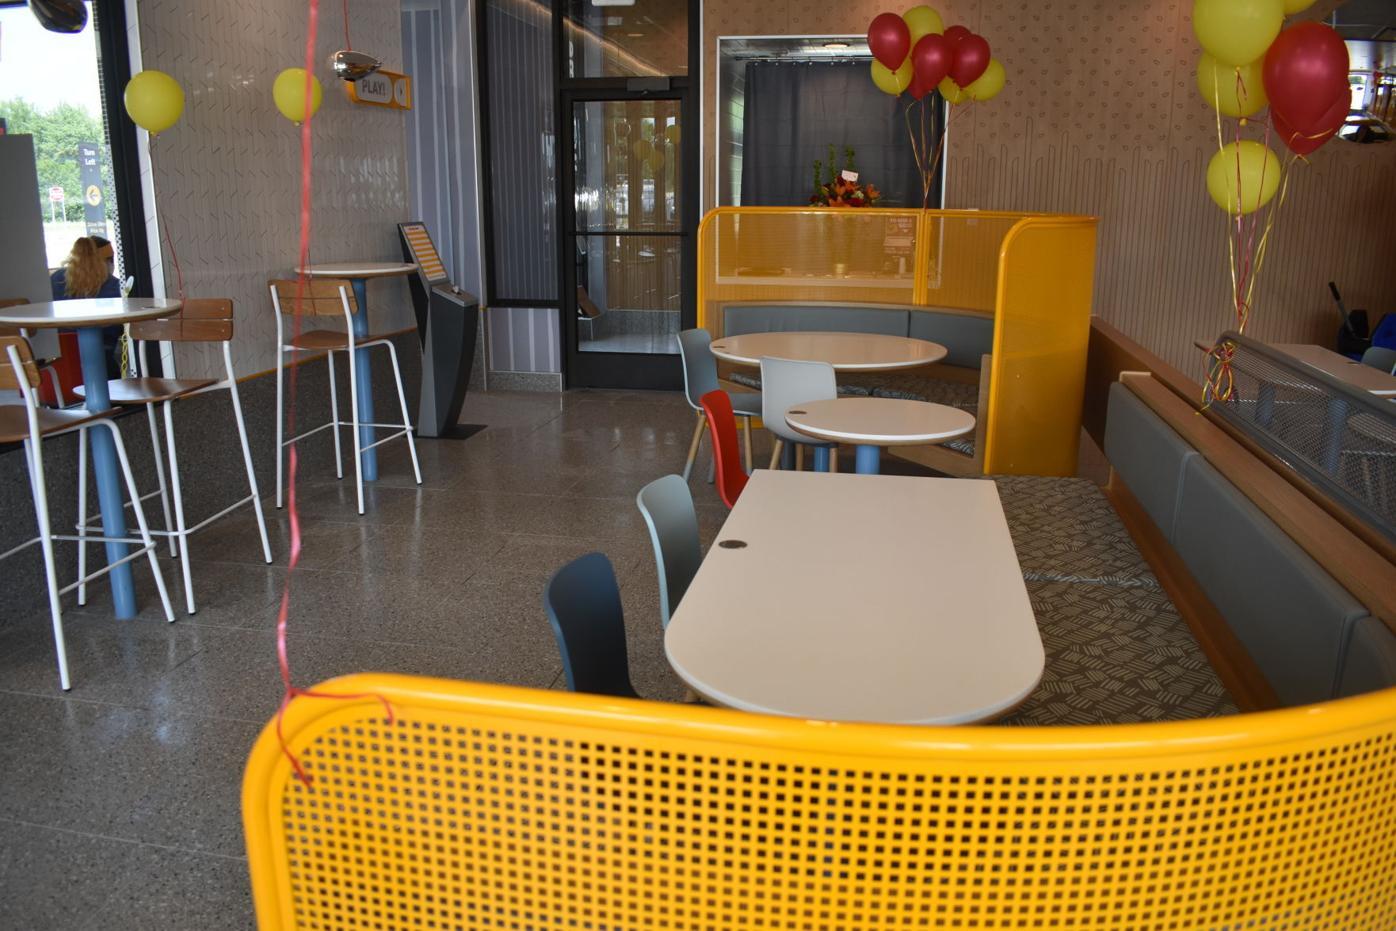 7.22 McDonald's Reopens 2